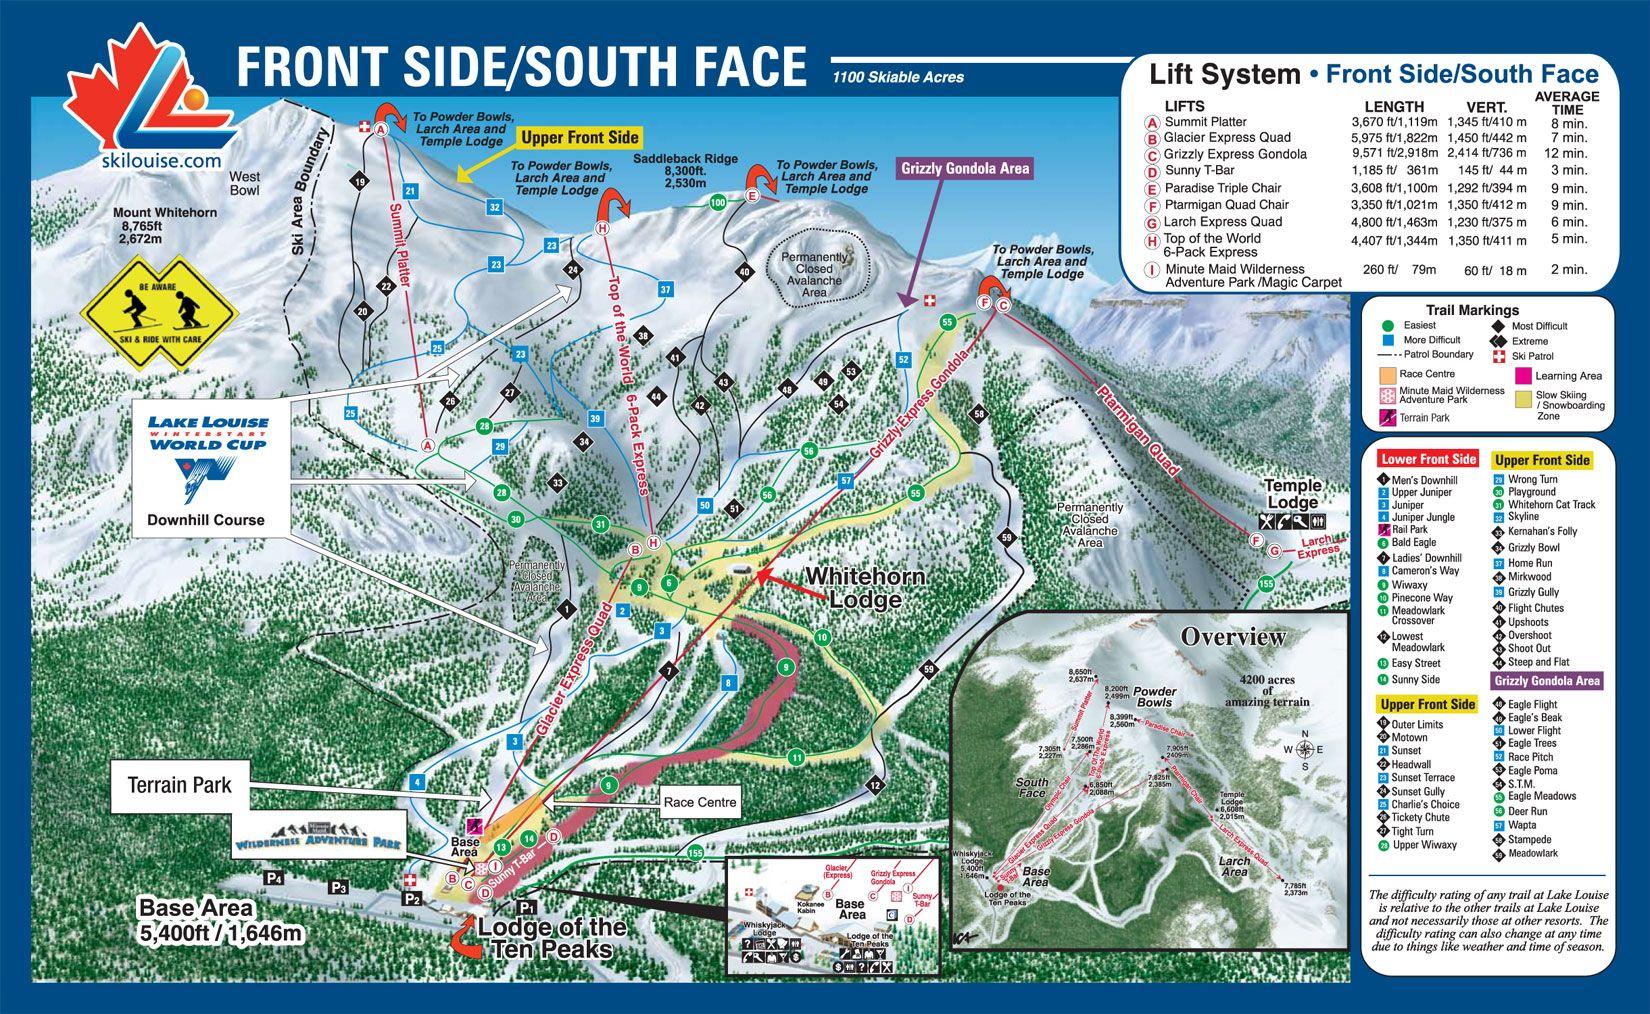 Ide maison upper michigan ski resorts map meuble publicscrutiny Gallery